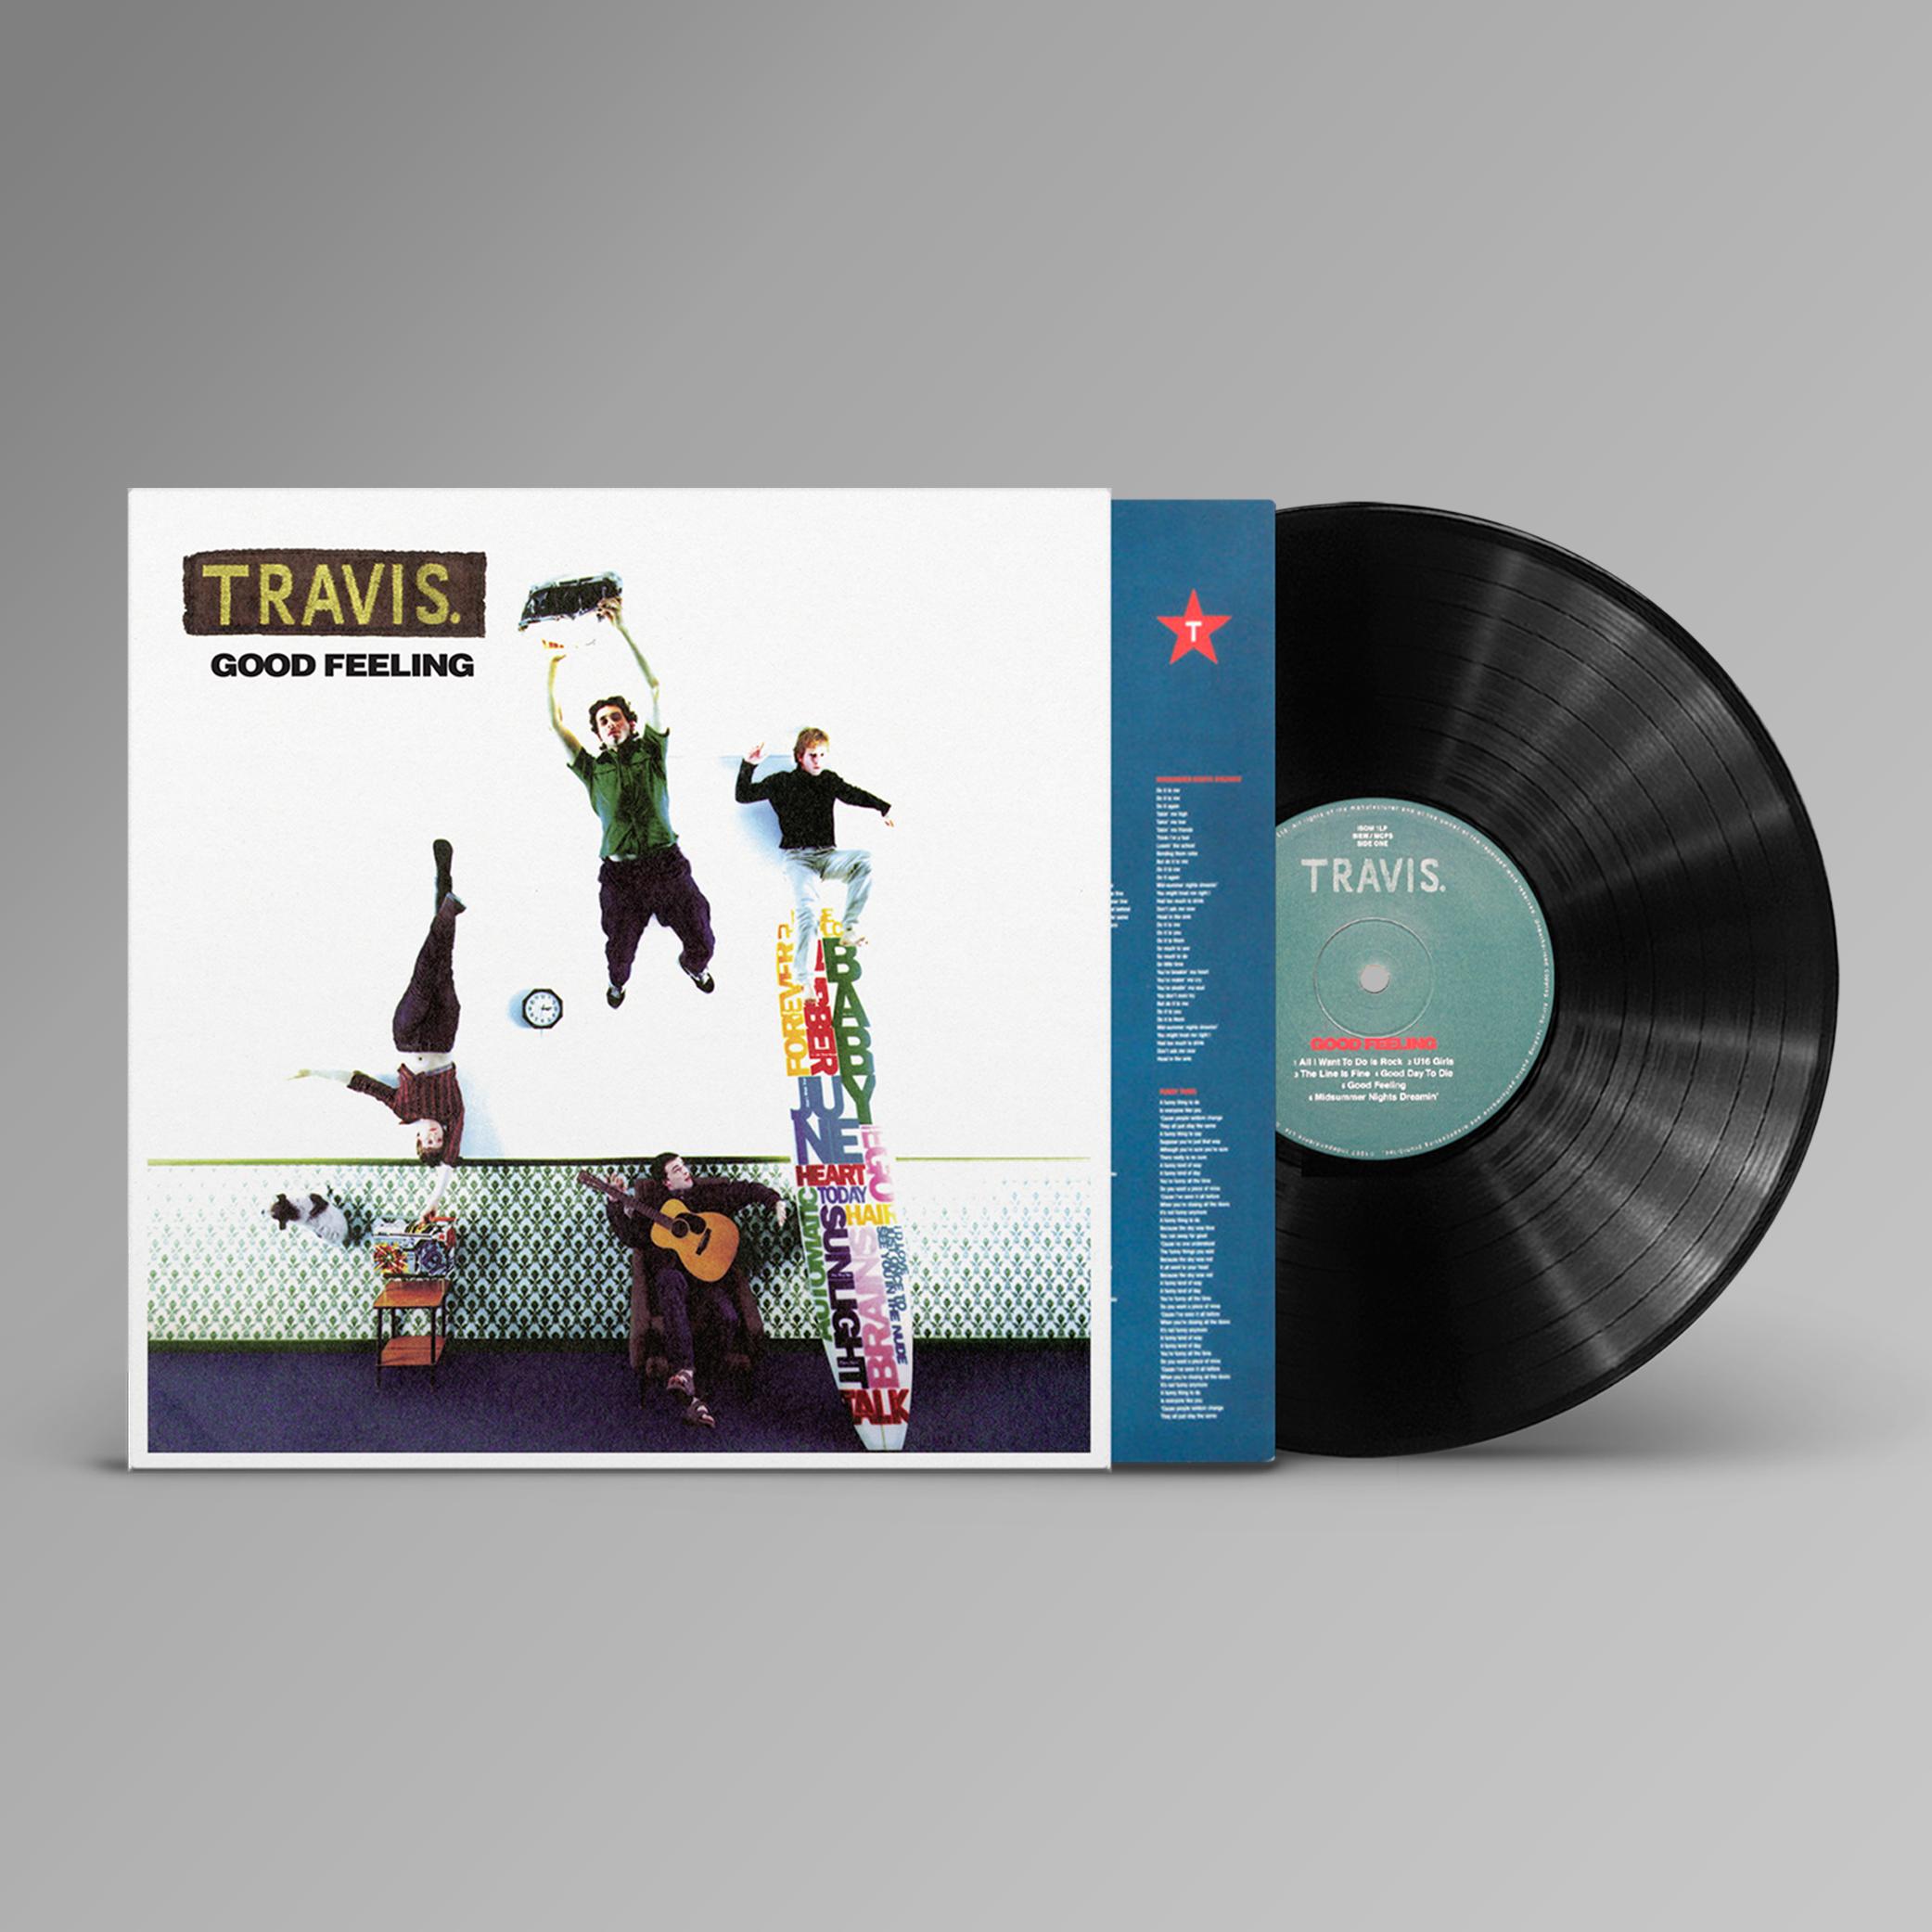 Buy Online Travis - Good Feeling (Reissue) Black Vinyl